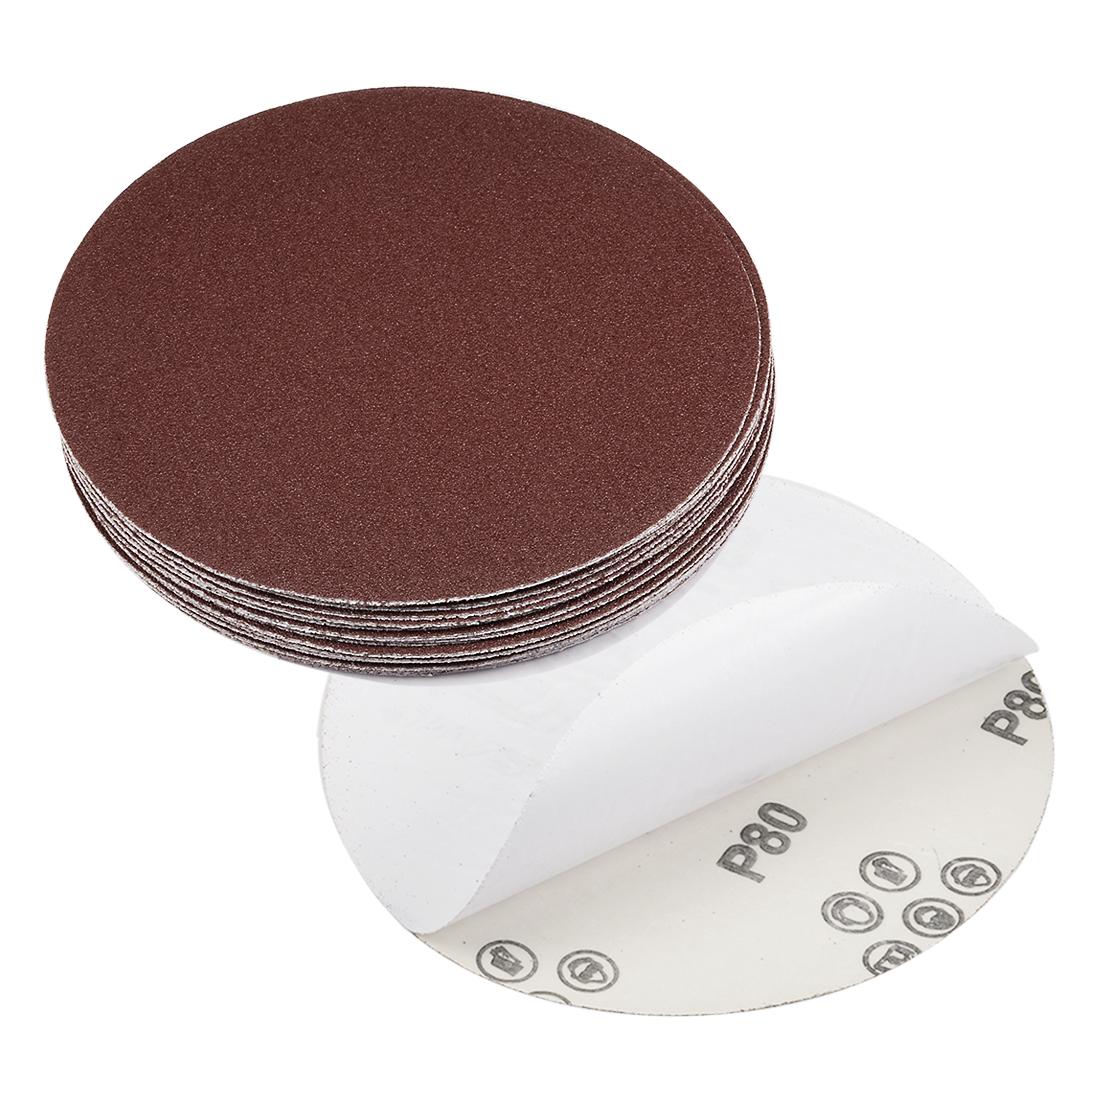 6-inch 80-Grits PSA Sanding Disc, Adhesive-Backed for Orbital Sander 20pcs